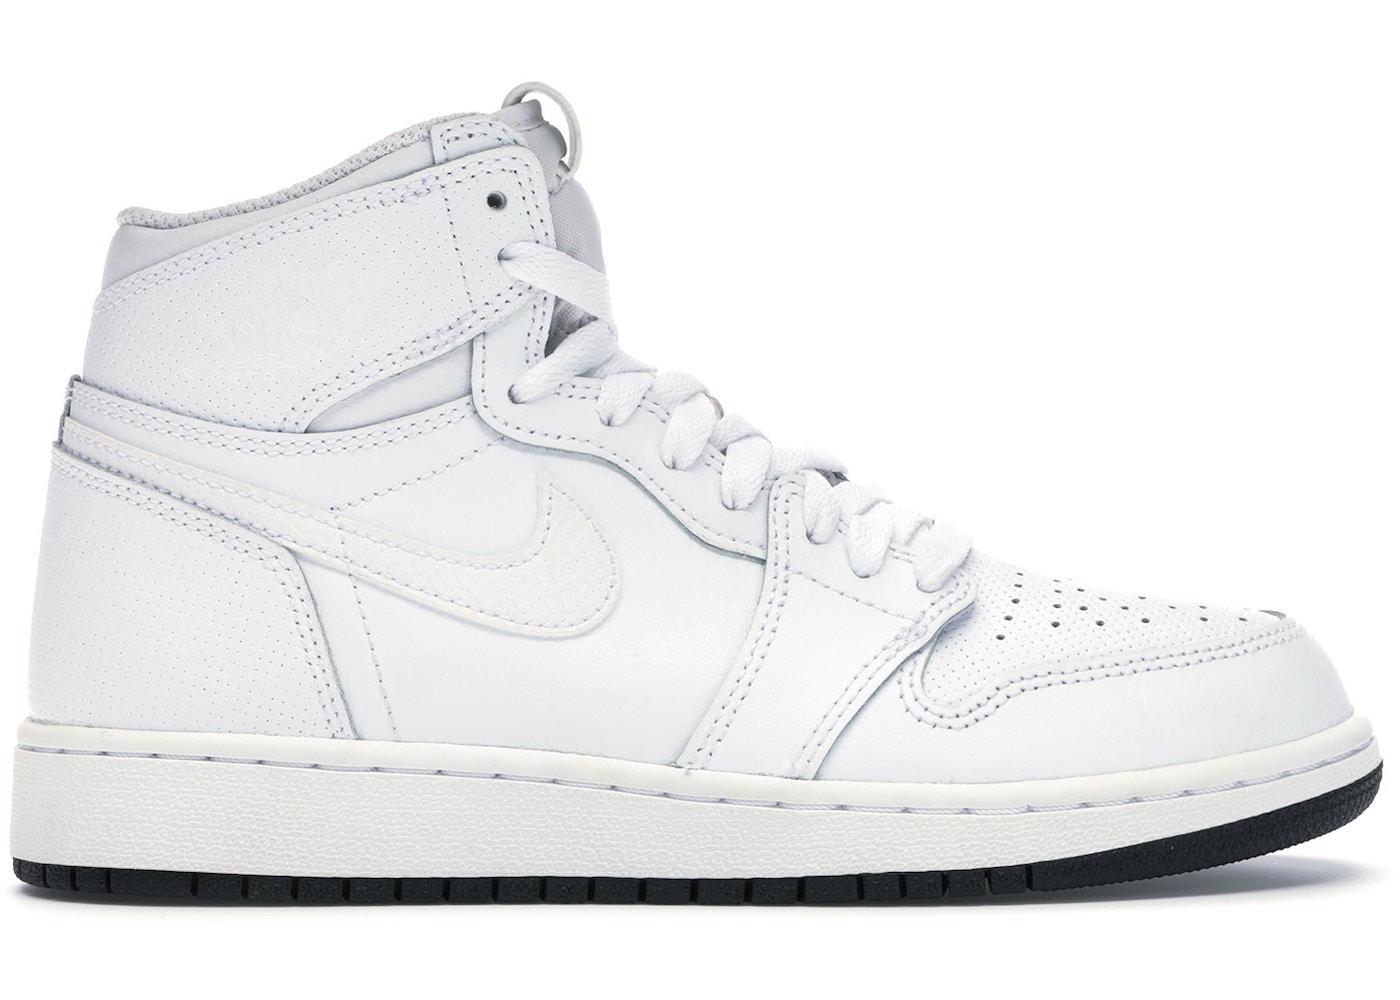 Jordan 1 Retro High Perforated White Gs 575441 100